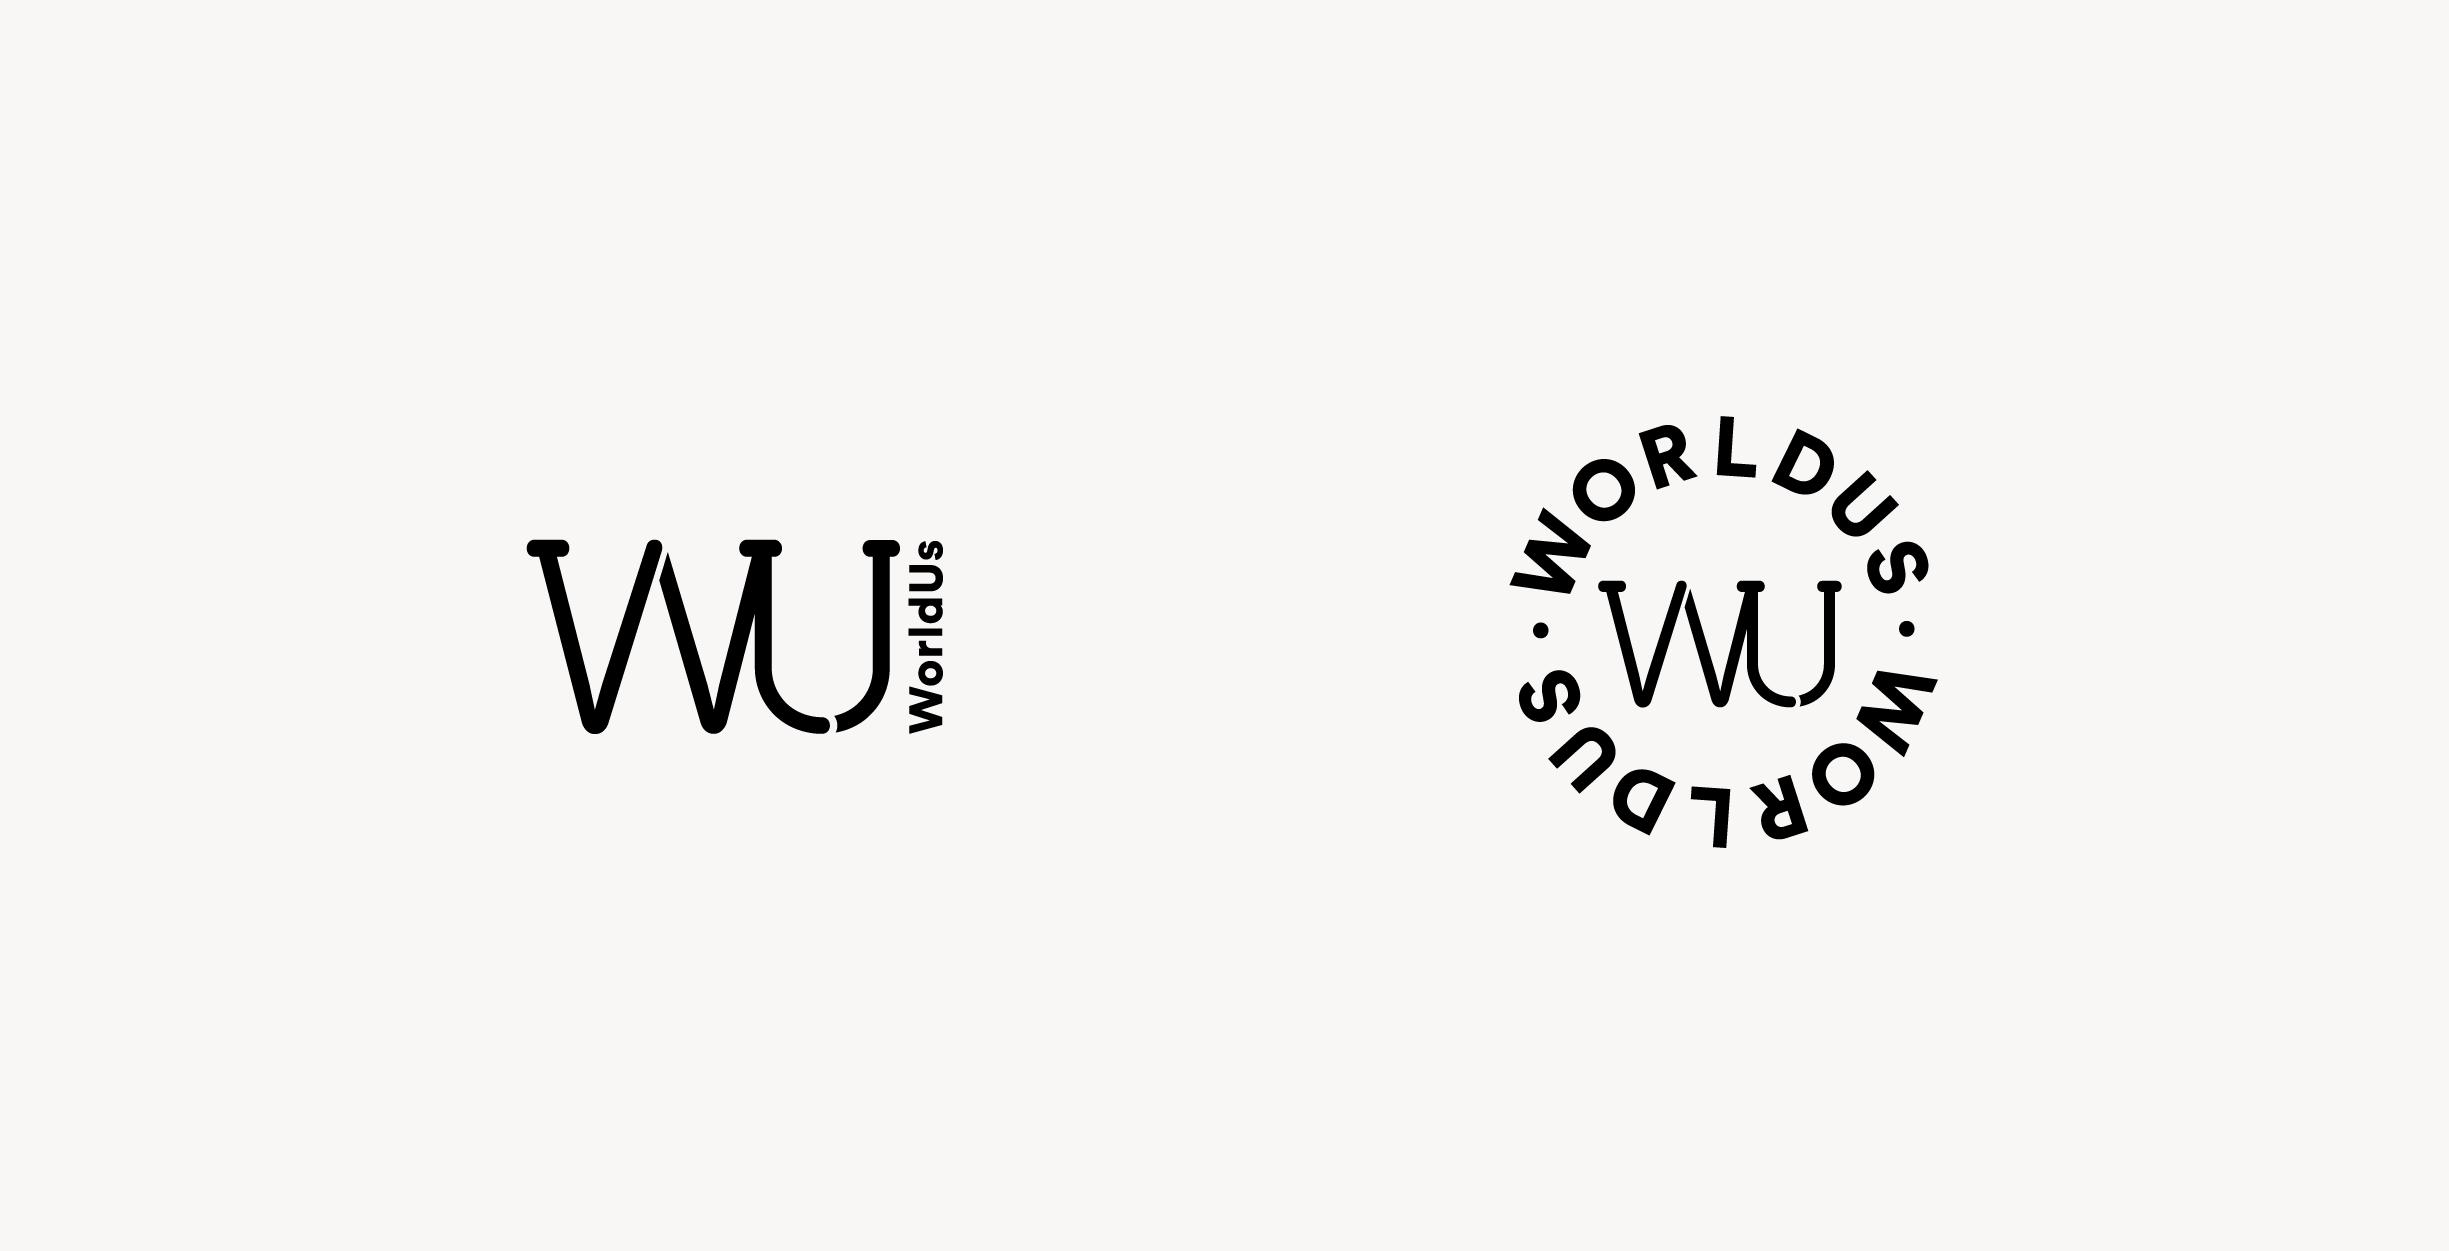 logos-2-v4-05